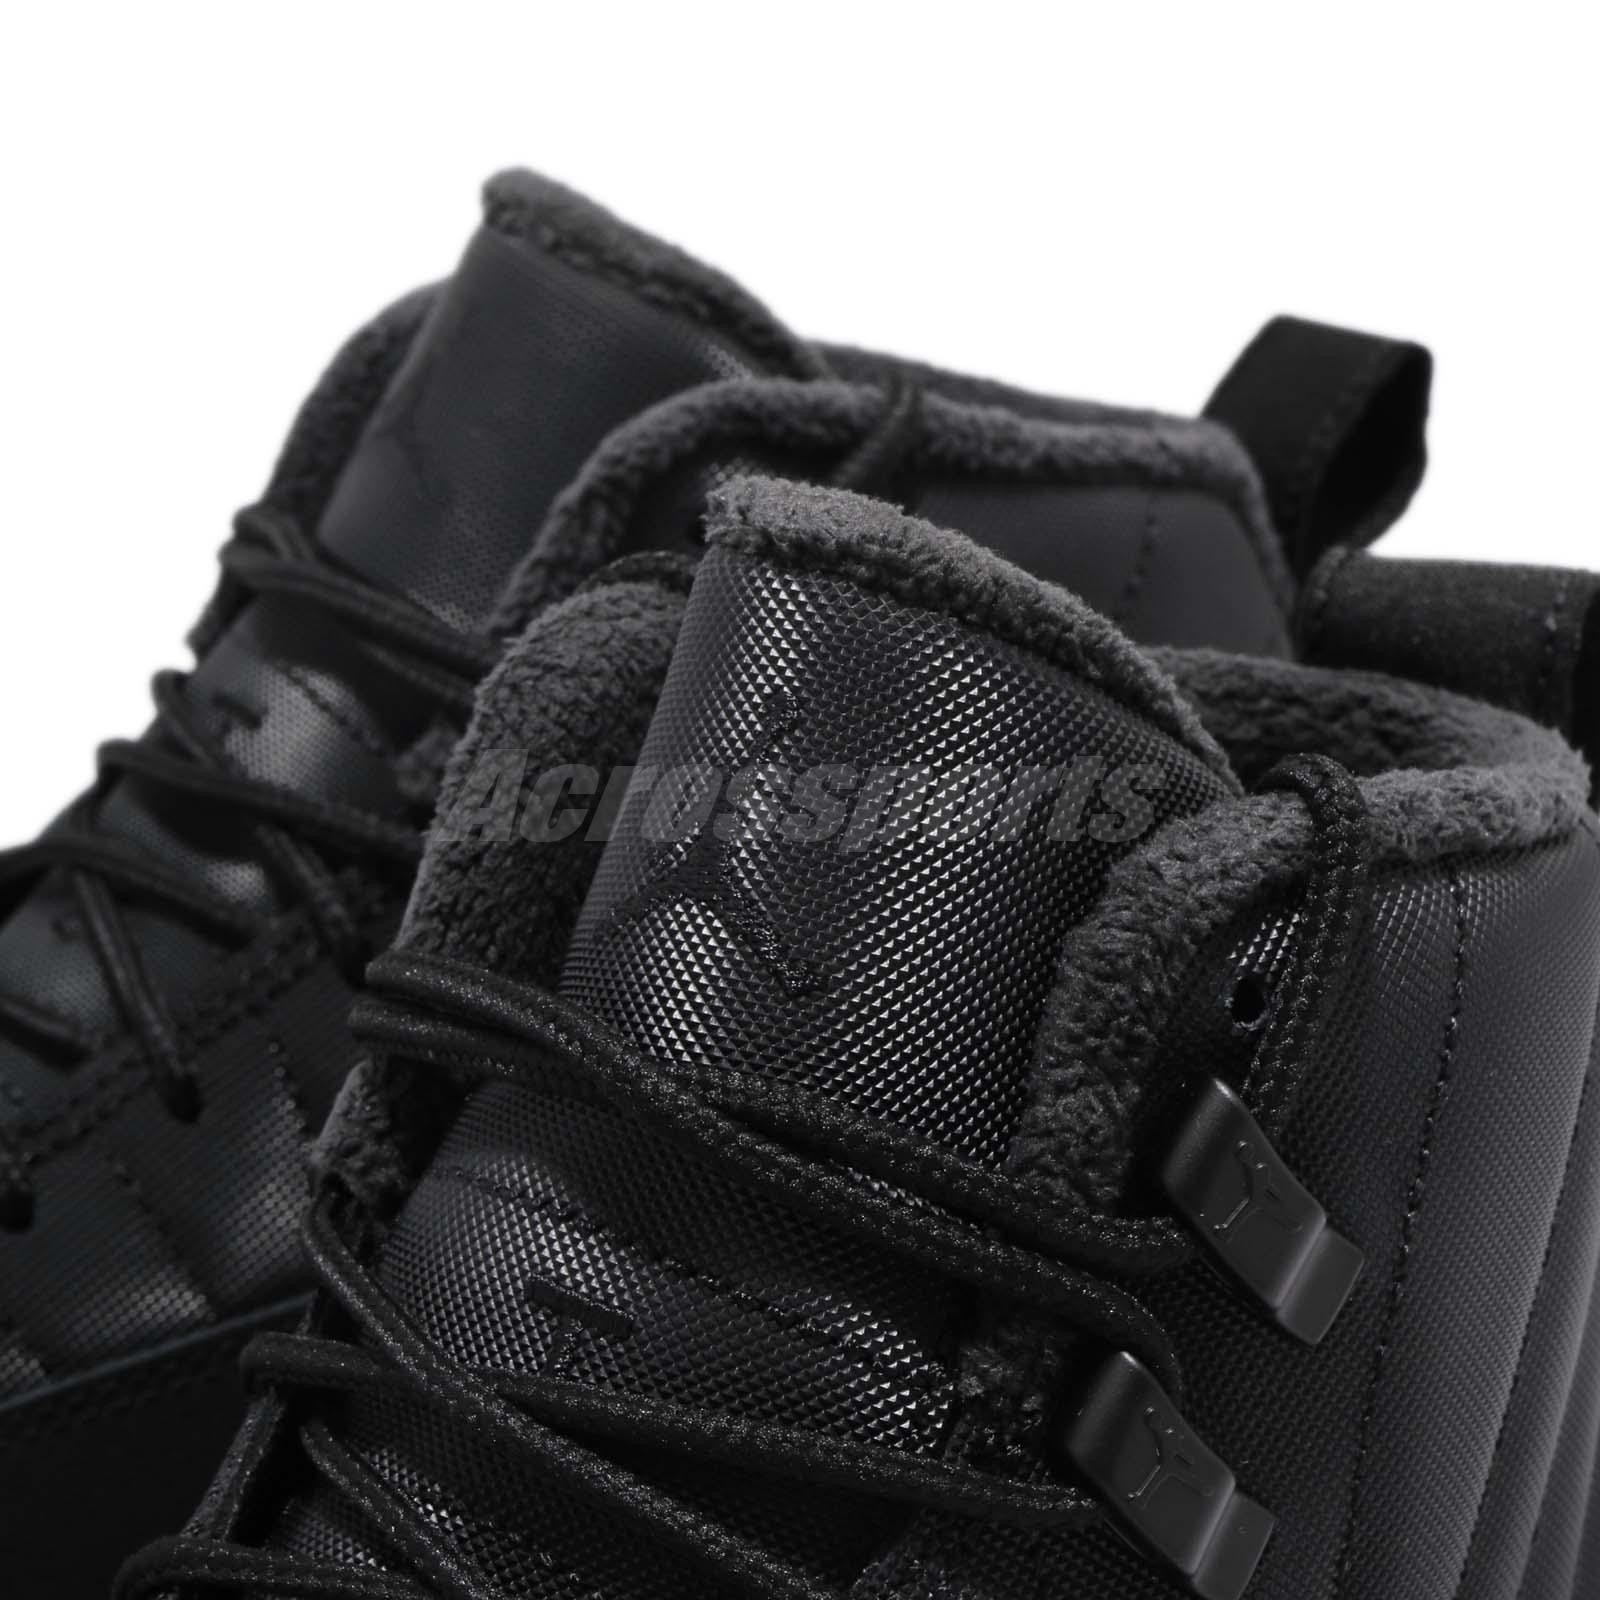 b2aa74bfb52e ... Nike Air Jordan 12 Retro WNTR BQ6851 001 Men Casual Shoes